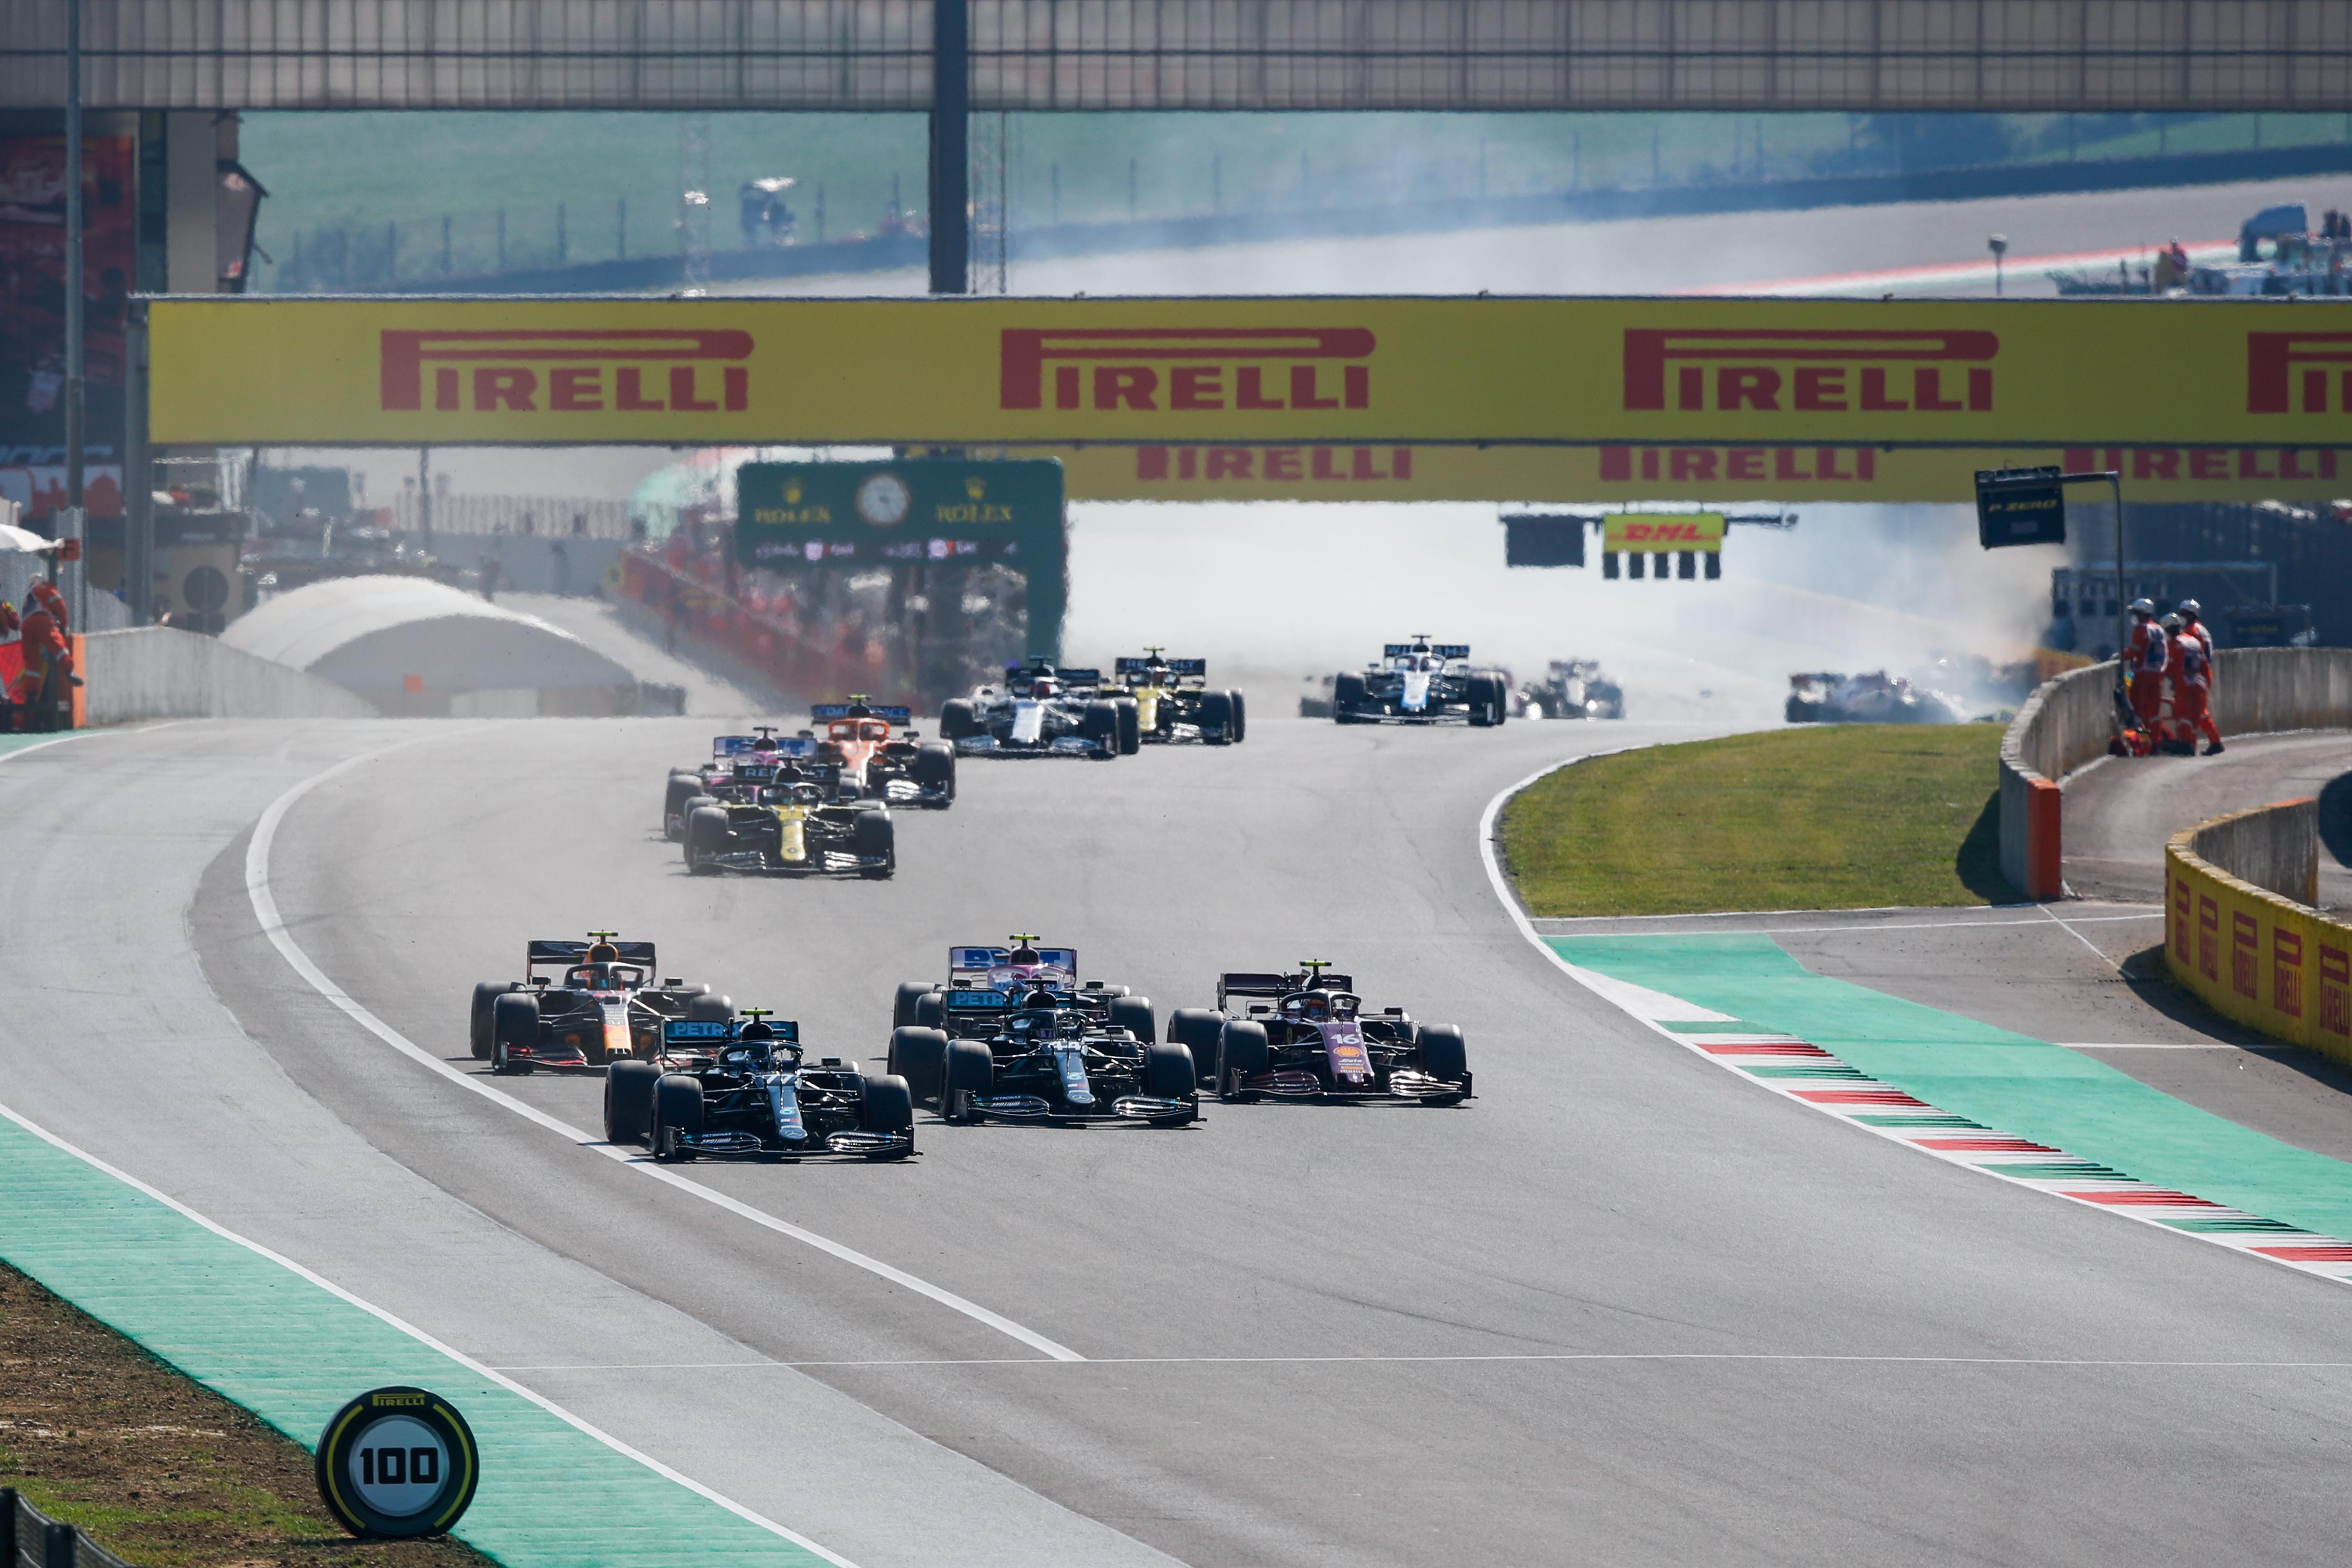 F1 Tuscan Grand Prix 2020 Part 2